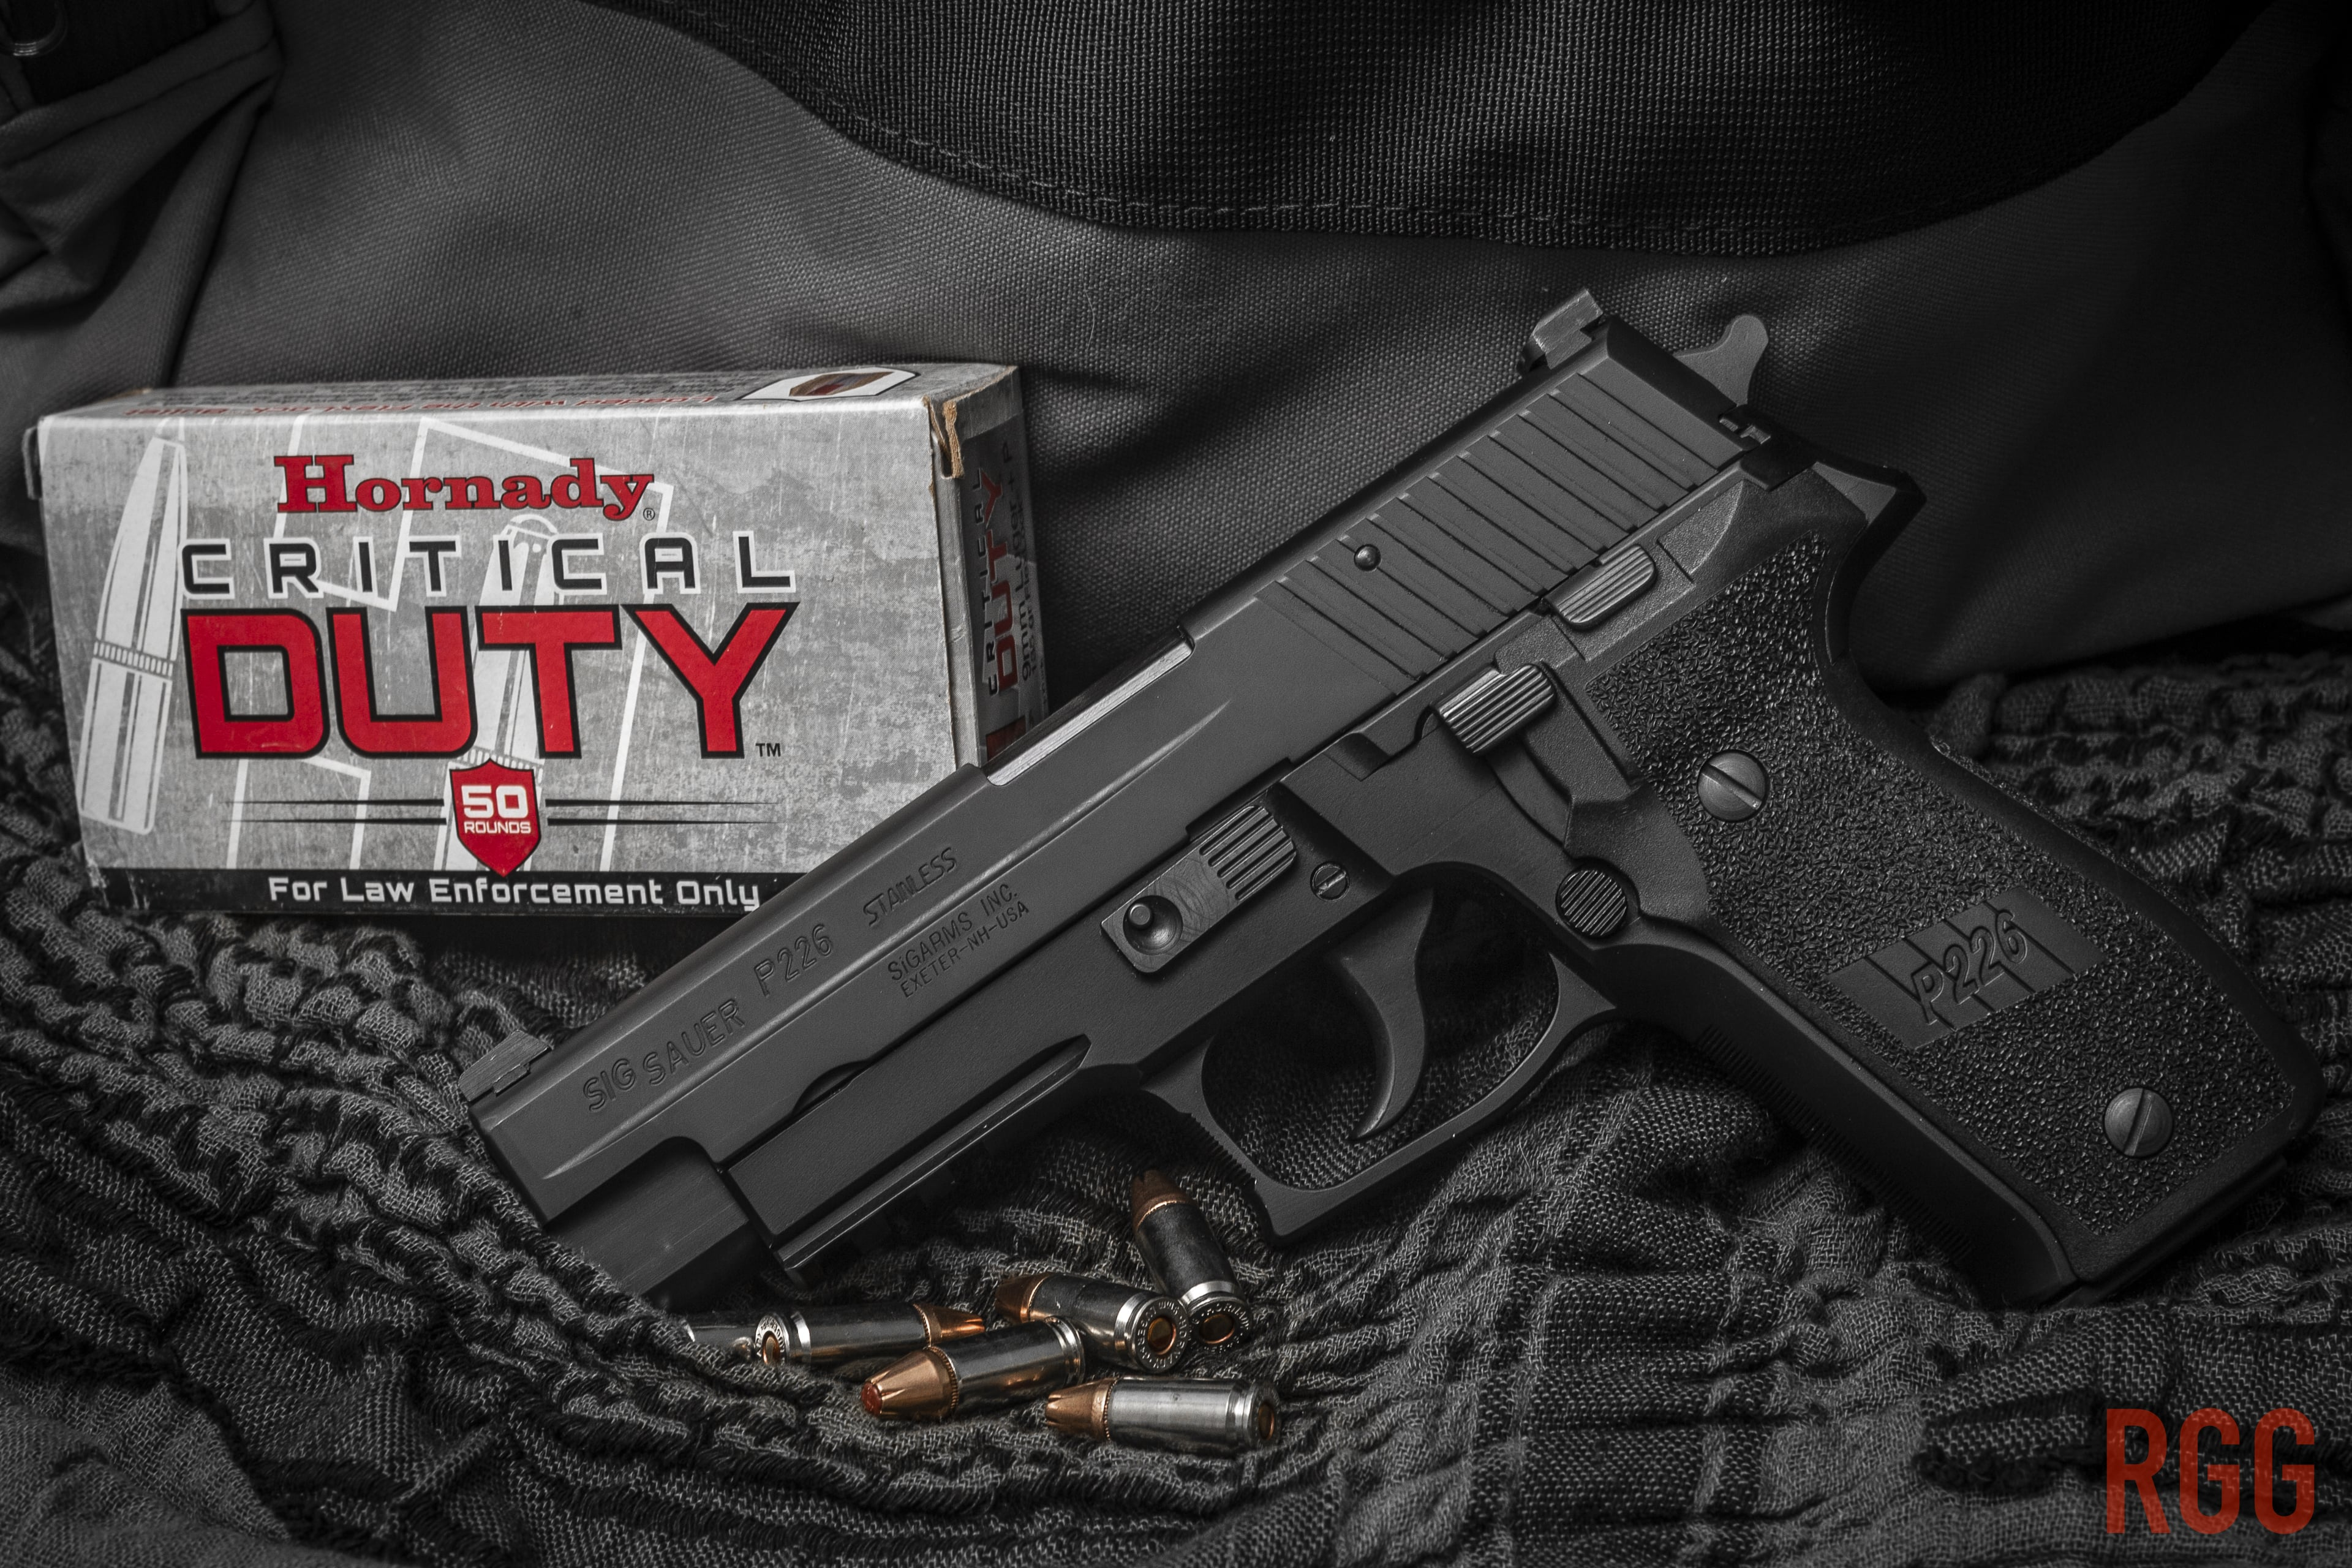 Episode 7 Of The Regular Guy Guns Podcast - Understand Us Gun Owners.